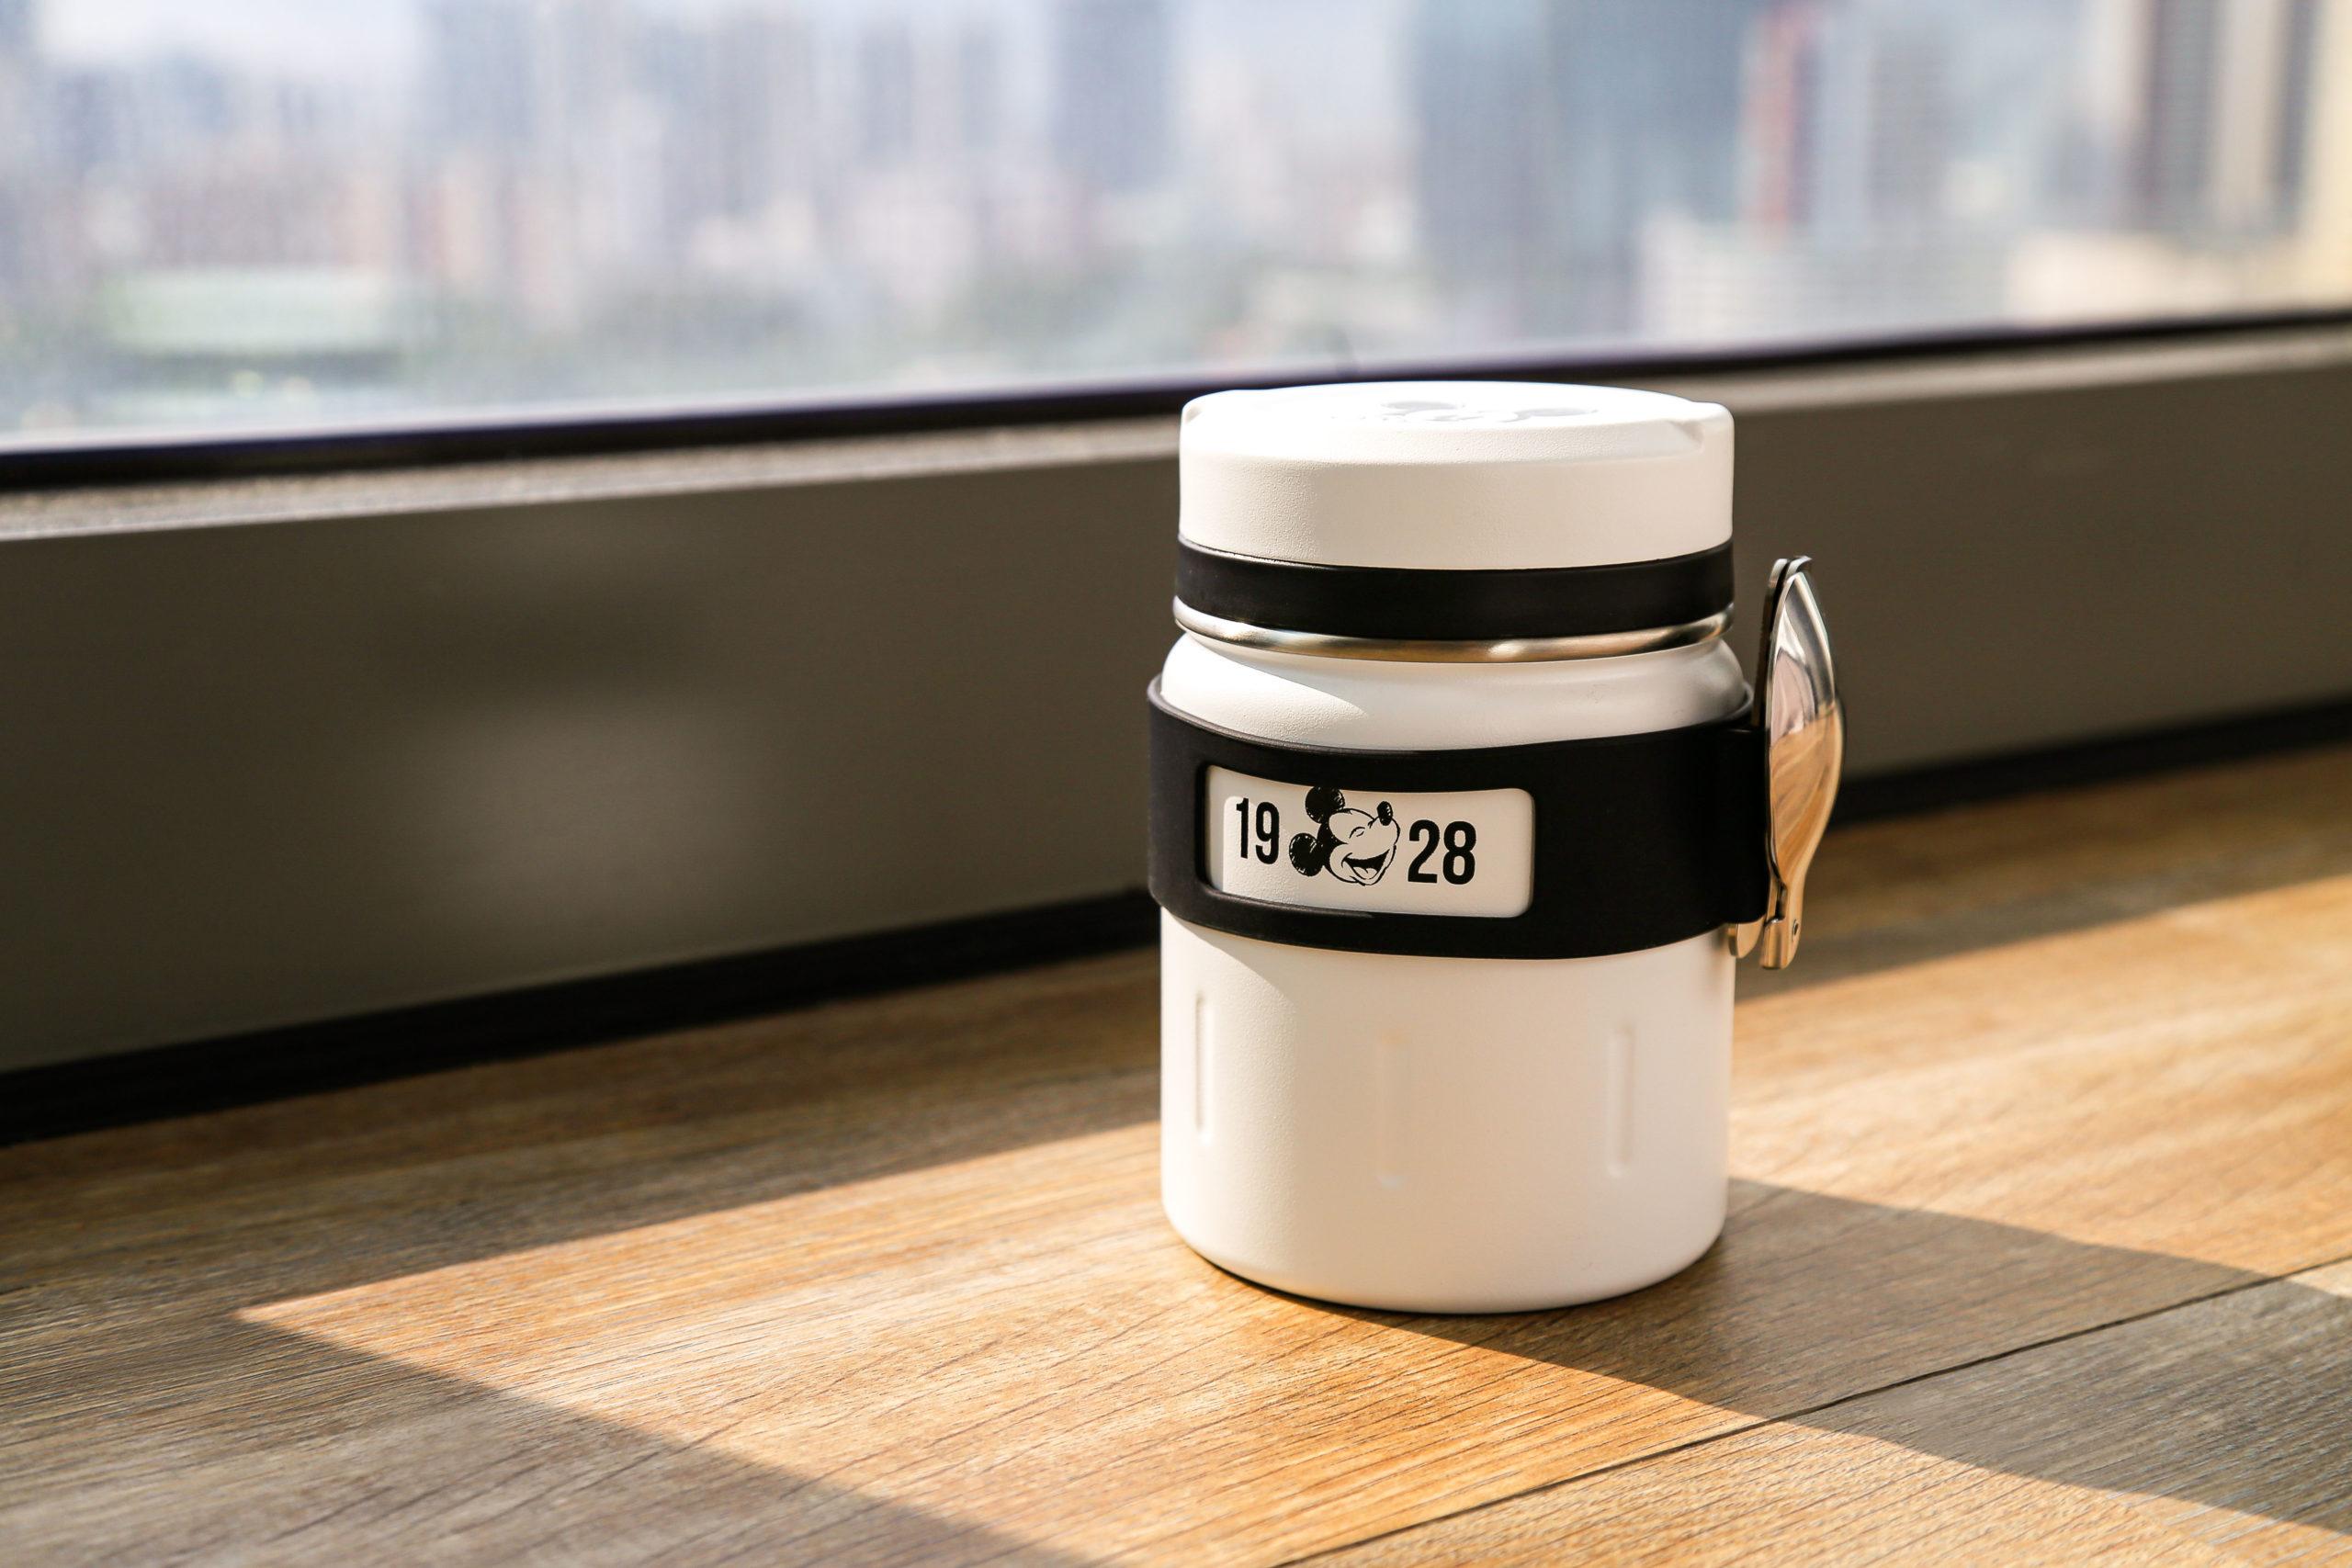 Fairprice Mickey Thermal Food Jar